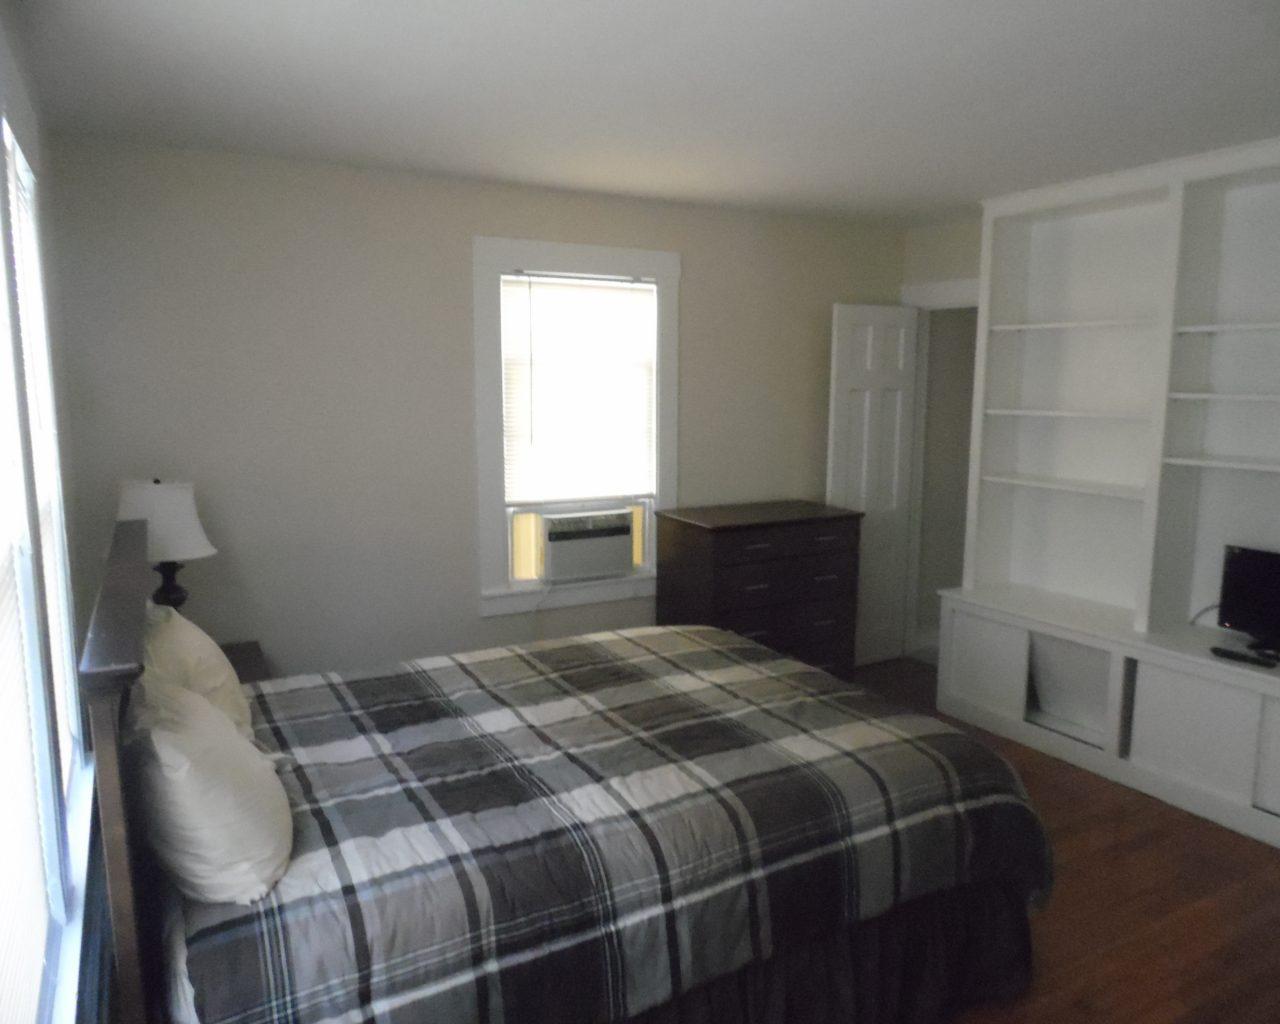 House 52 Bedroom